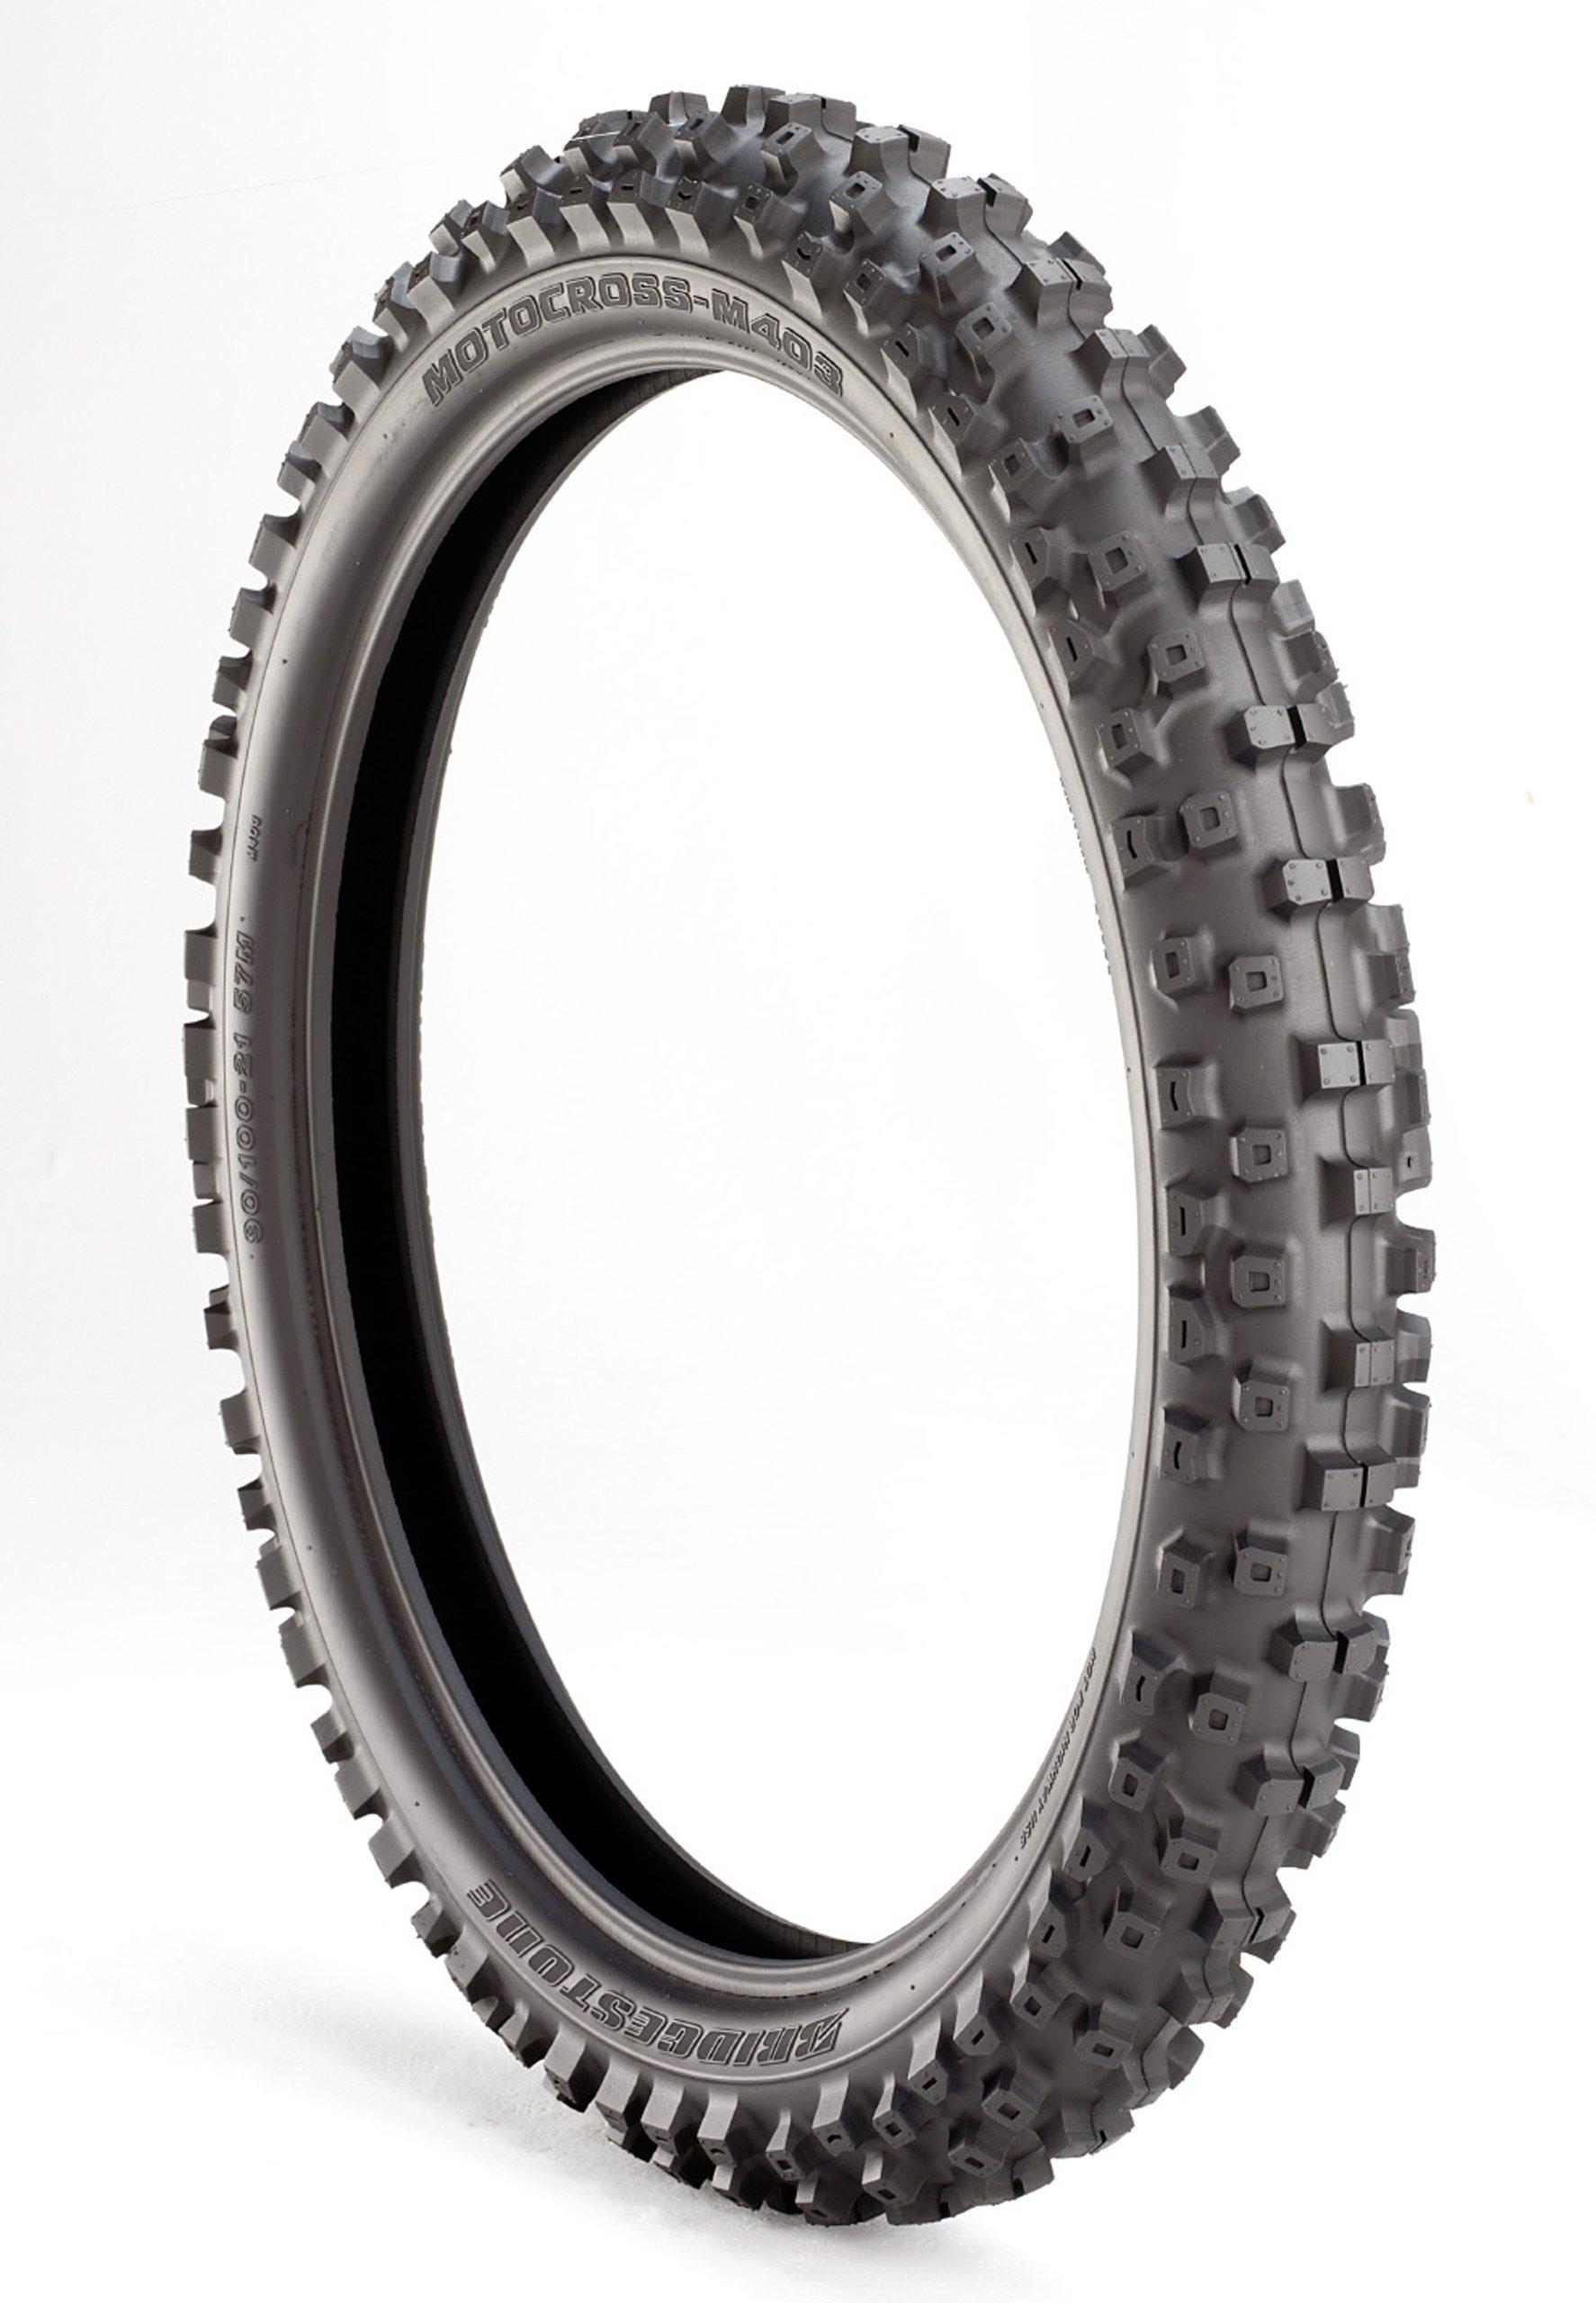 Bridgestone M403 Motocross Front Tire 60/100-14